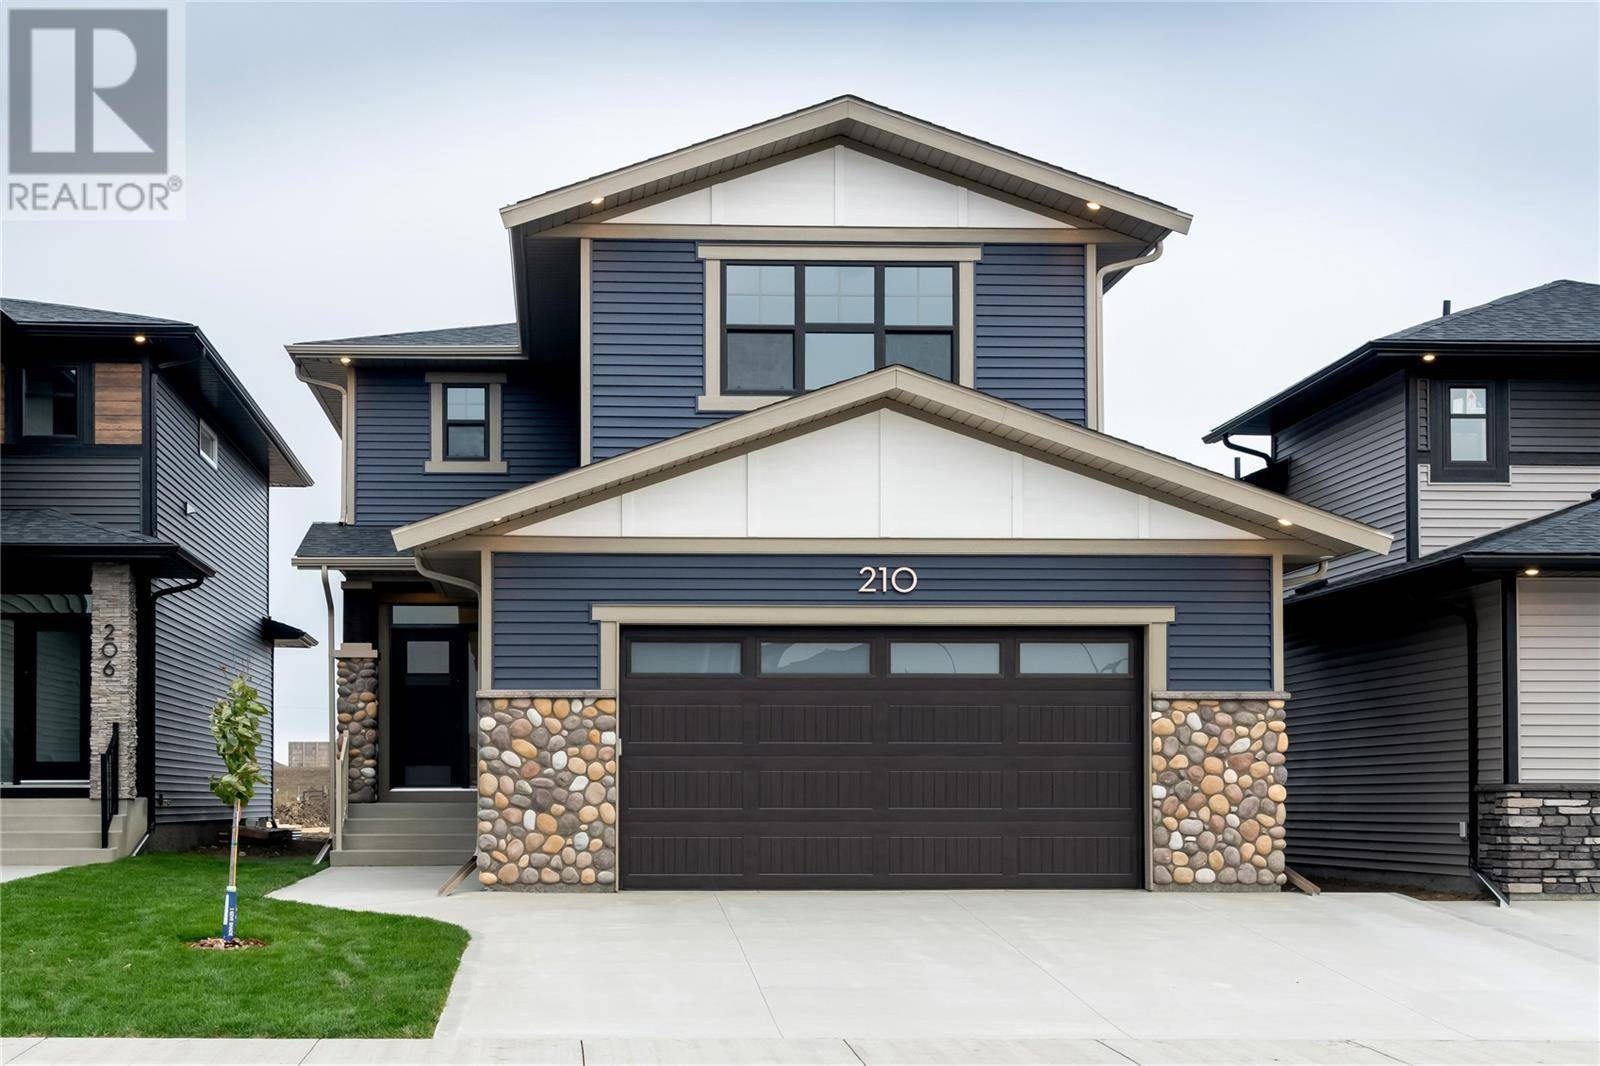 House for sale at 210 Germain Ct Saskatoon Saskatchewan - MLS: SK788353